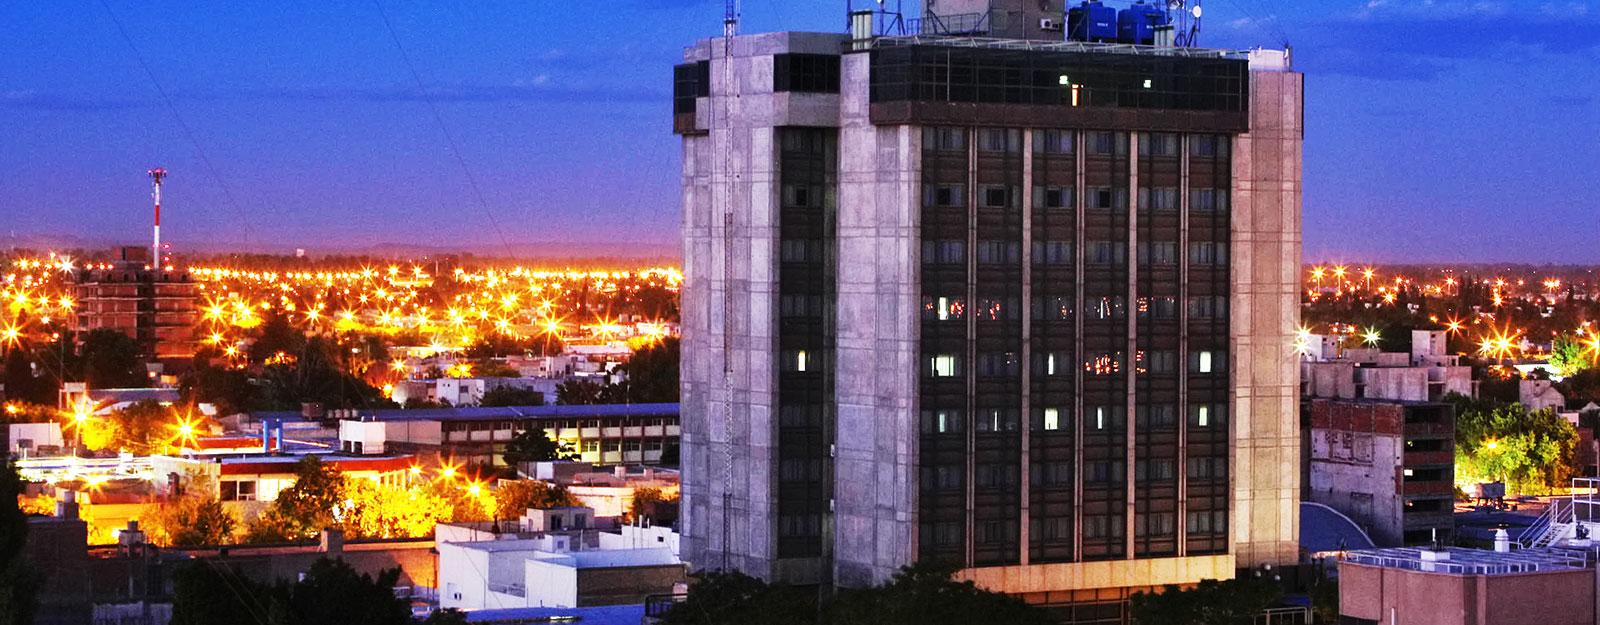 Edificio ALKAZAR Hotel - San Juan